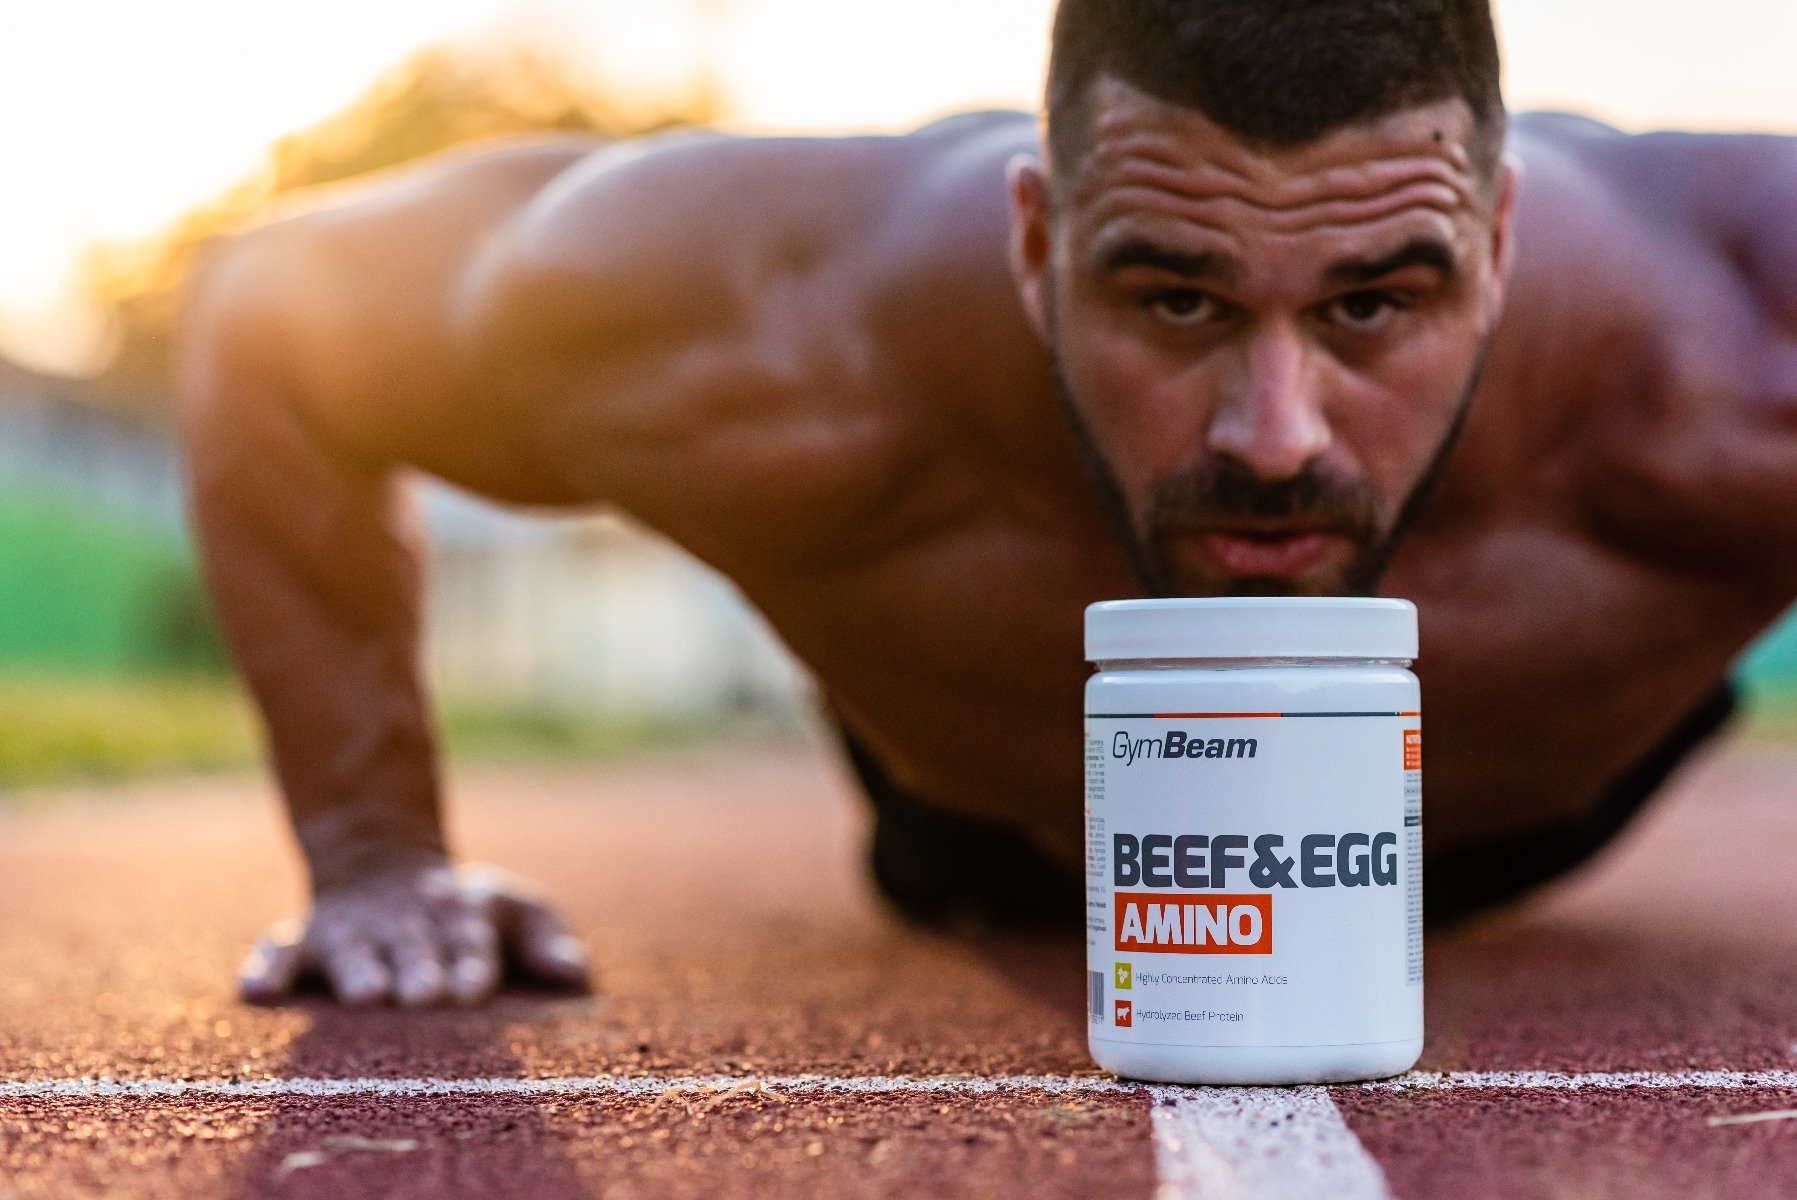 Beef&Egg amino - GymBeam